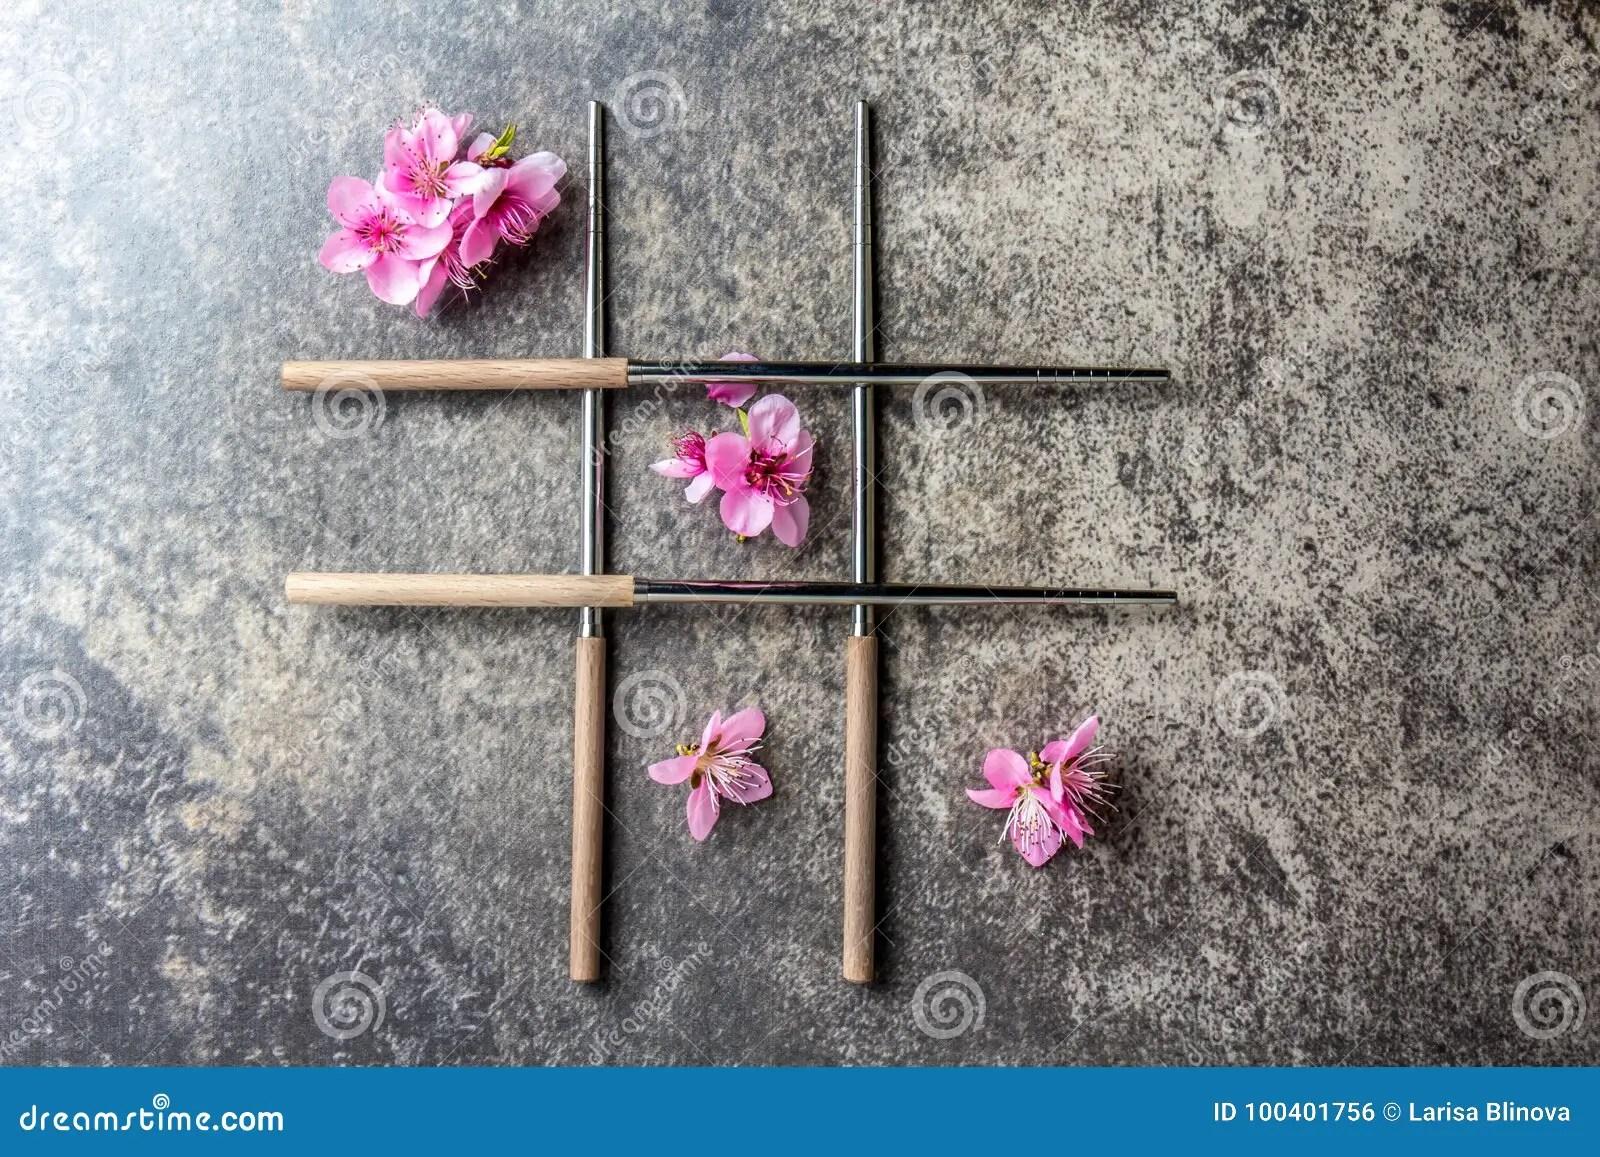 chopsticks and sakura flowers